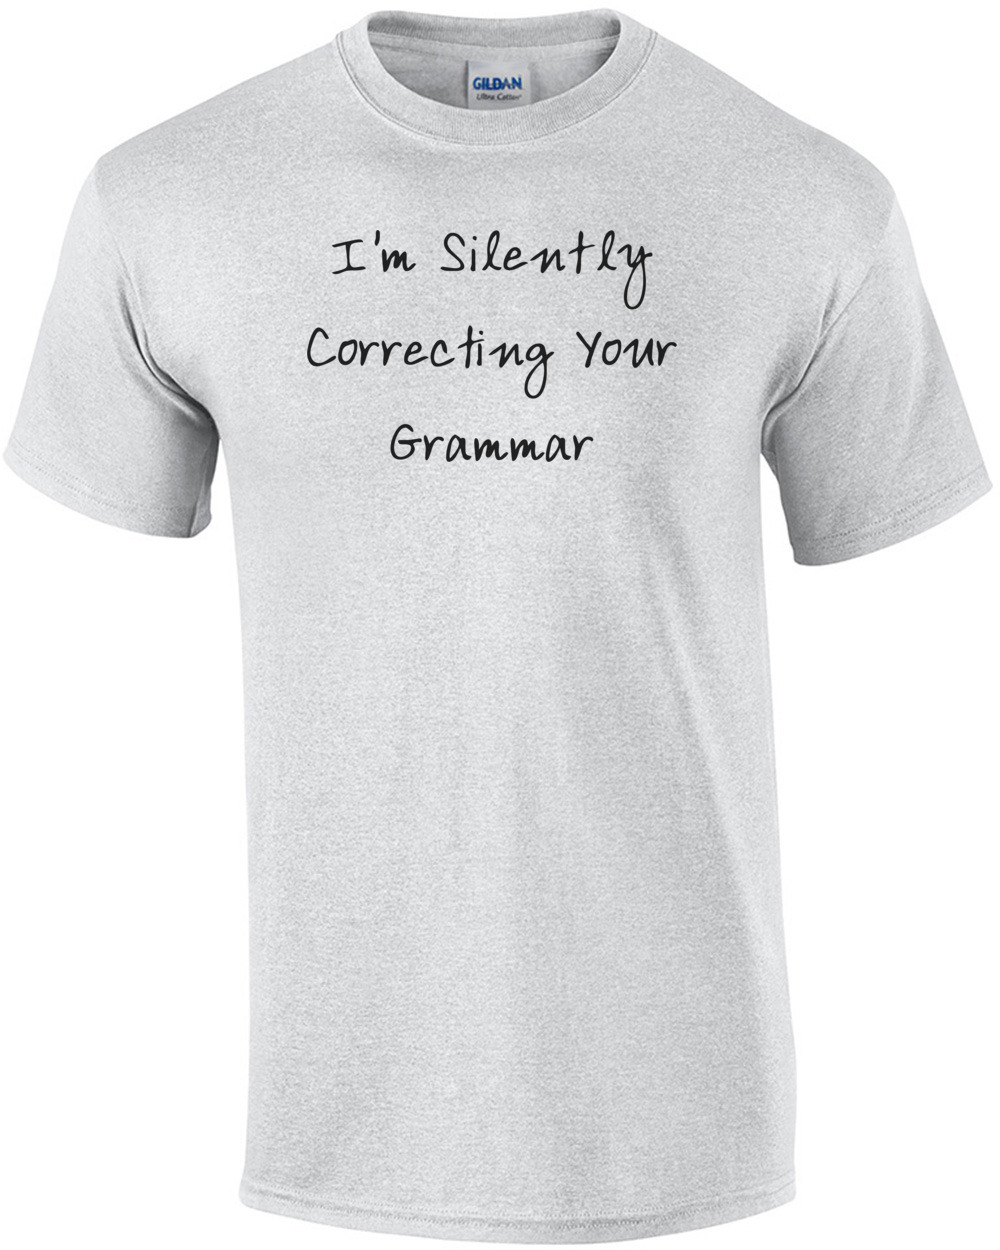 d6844c06 I'm Silently Correcting Your Grammar shirt